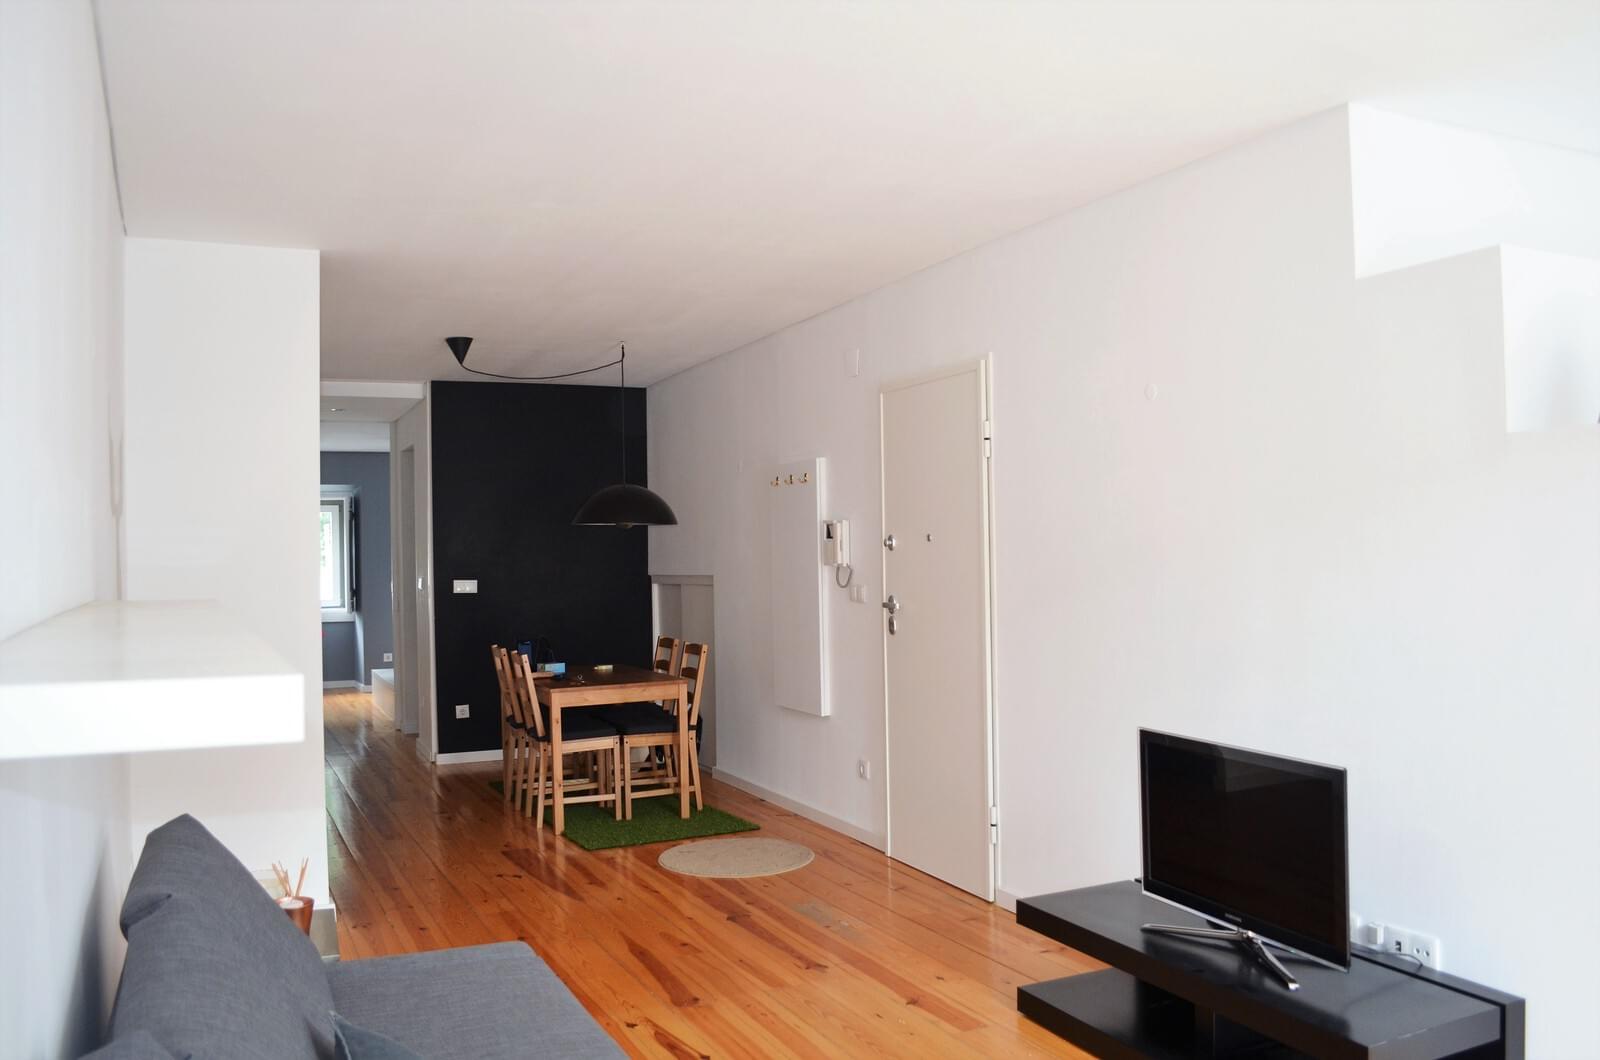 pf17785-apartamento-t1-lisboa-099bd73a-6594-4afa-9add-3ae7cdbf177d